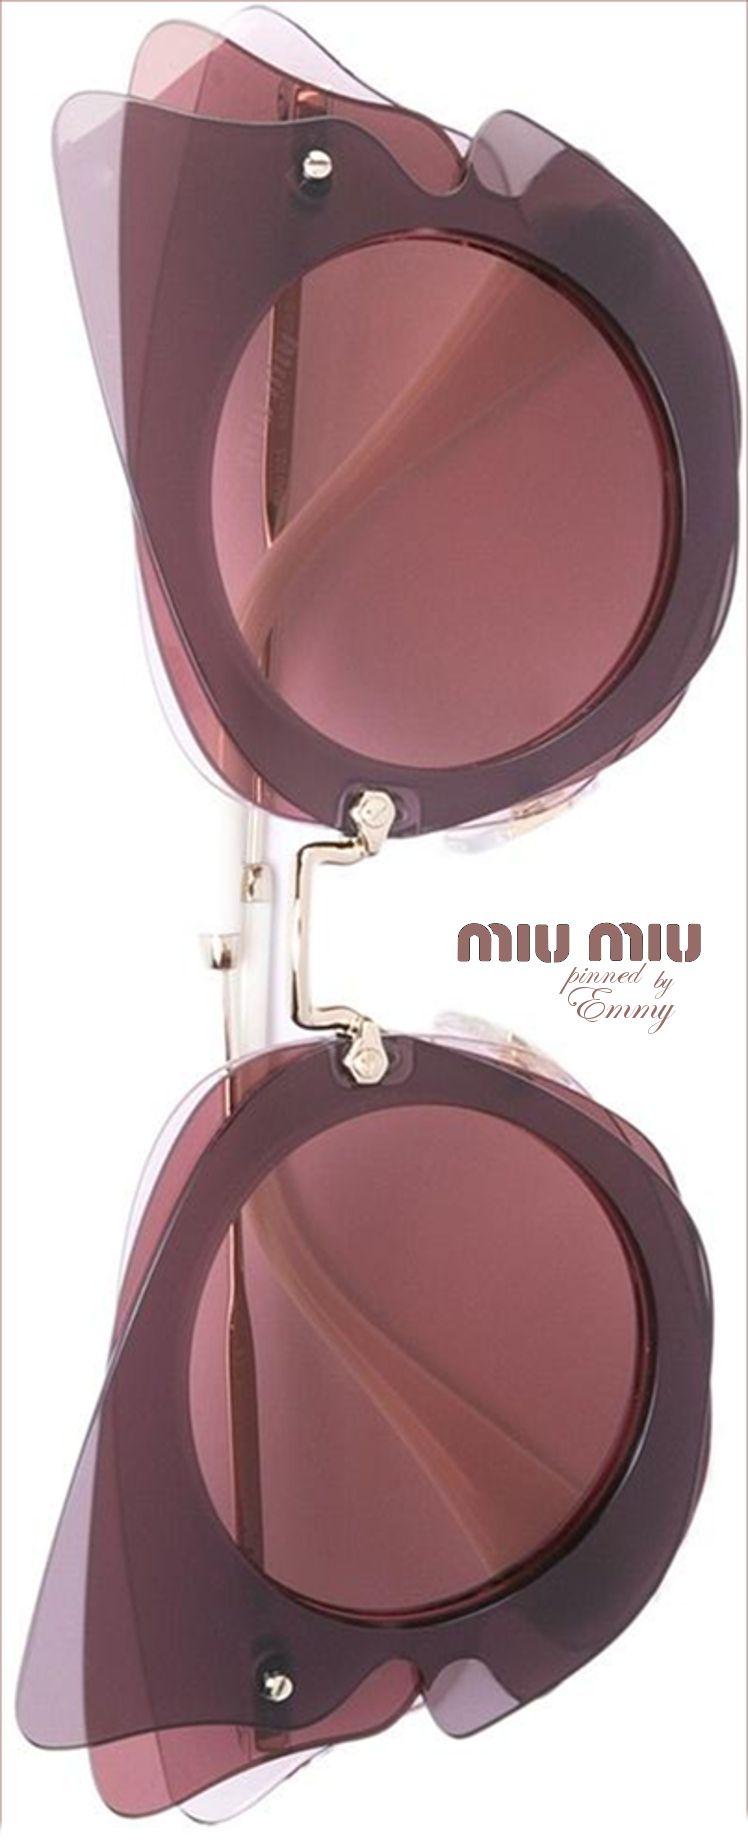 6cd7d9e0ea6451 Miu Miu Eyewear Oversized Sunglasses - Farfetch